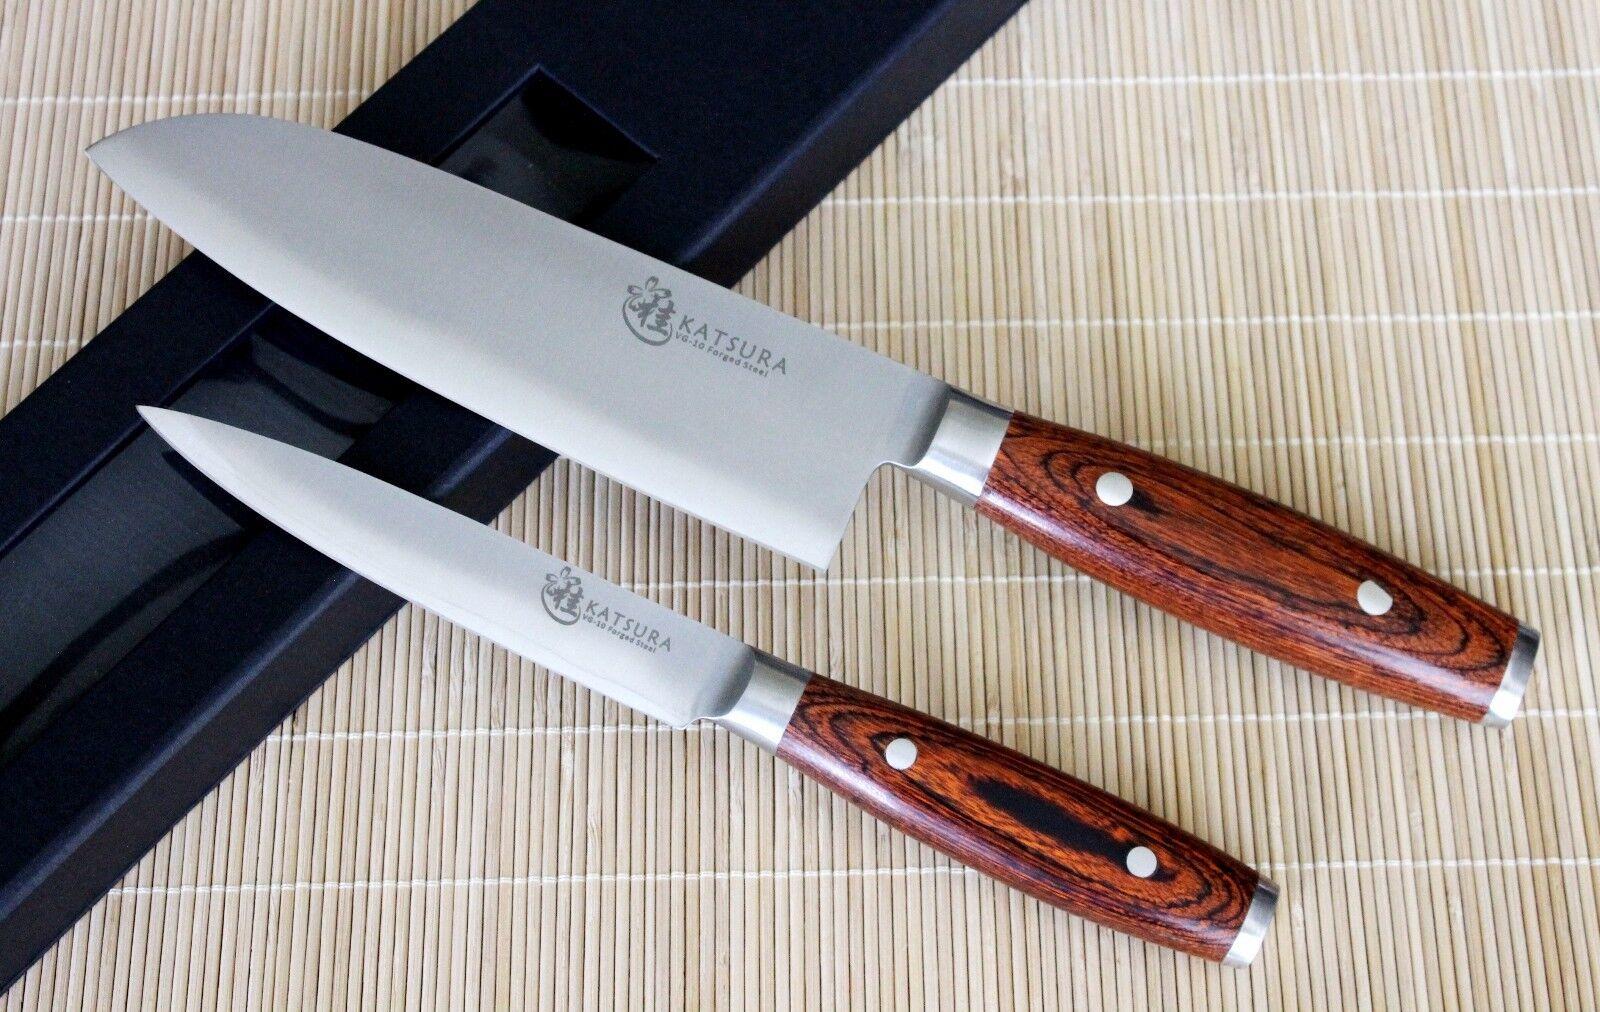 KATSURA Japanese VG-10 3 Layer Forged Steel 7in Santoku knife Set , 2pcs